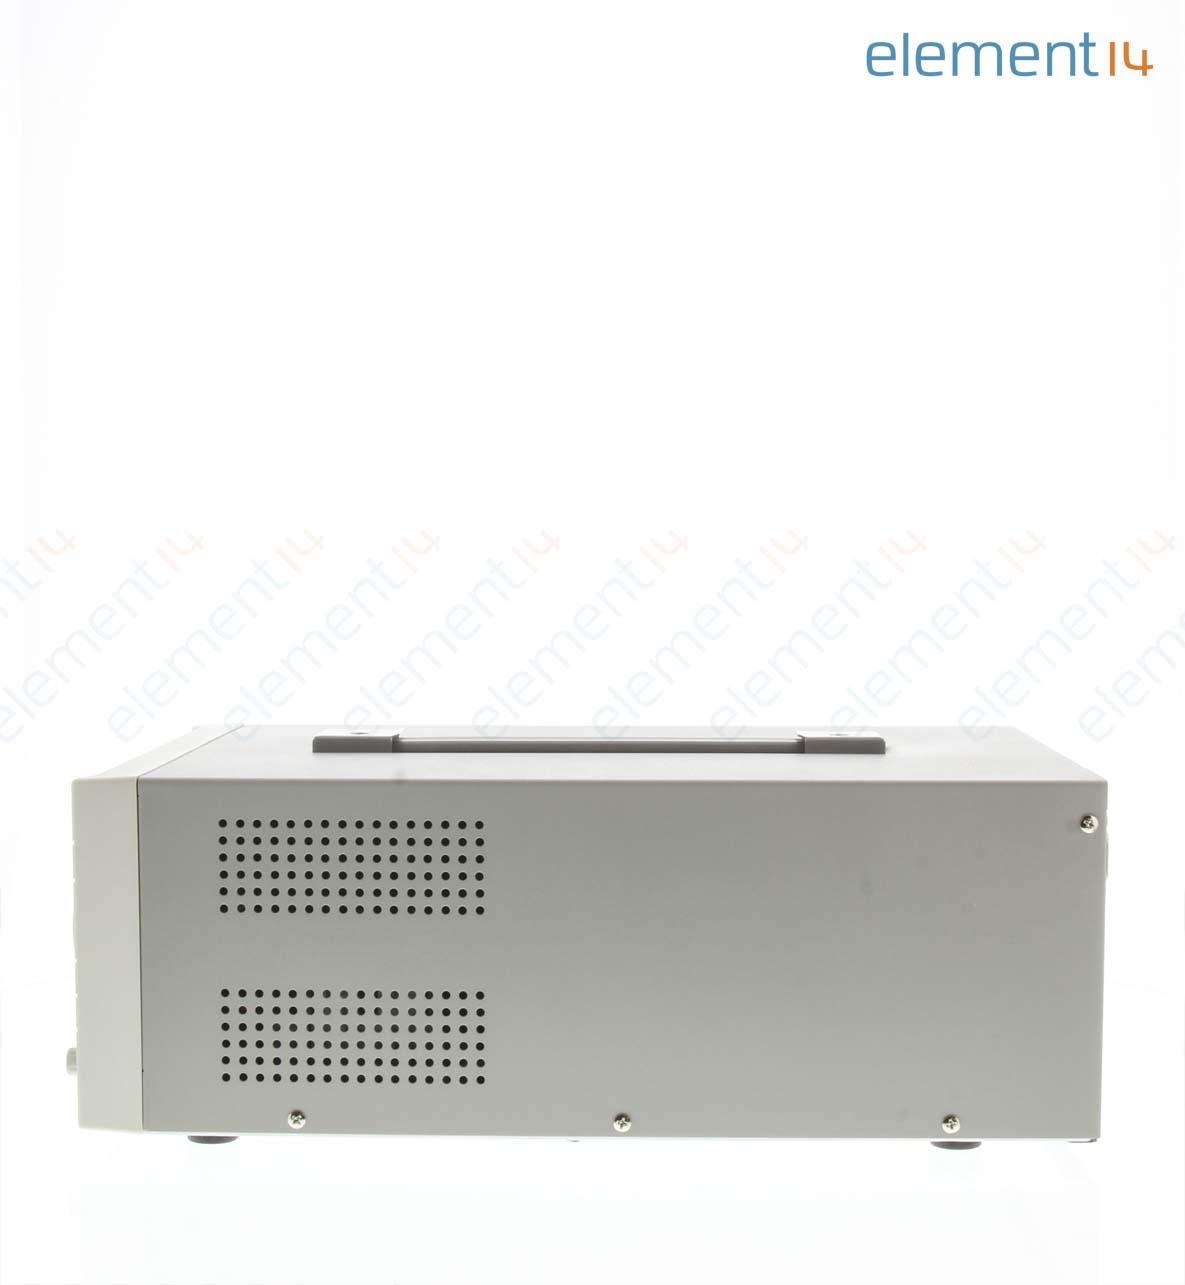 Bench Power Supply, Linear DC, Programmable, 3 Output, 0 V, 32 V, 0 A, 2 A